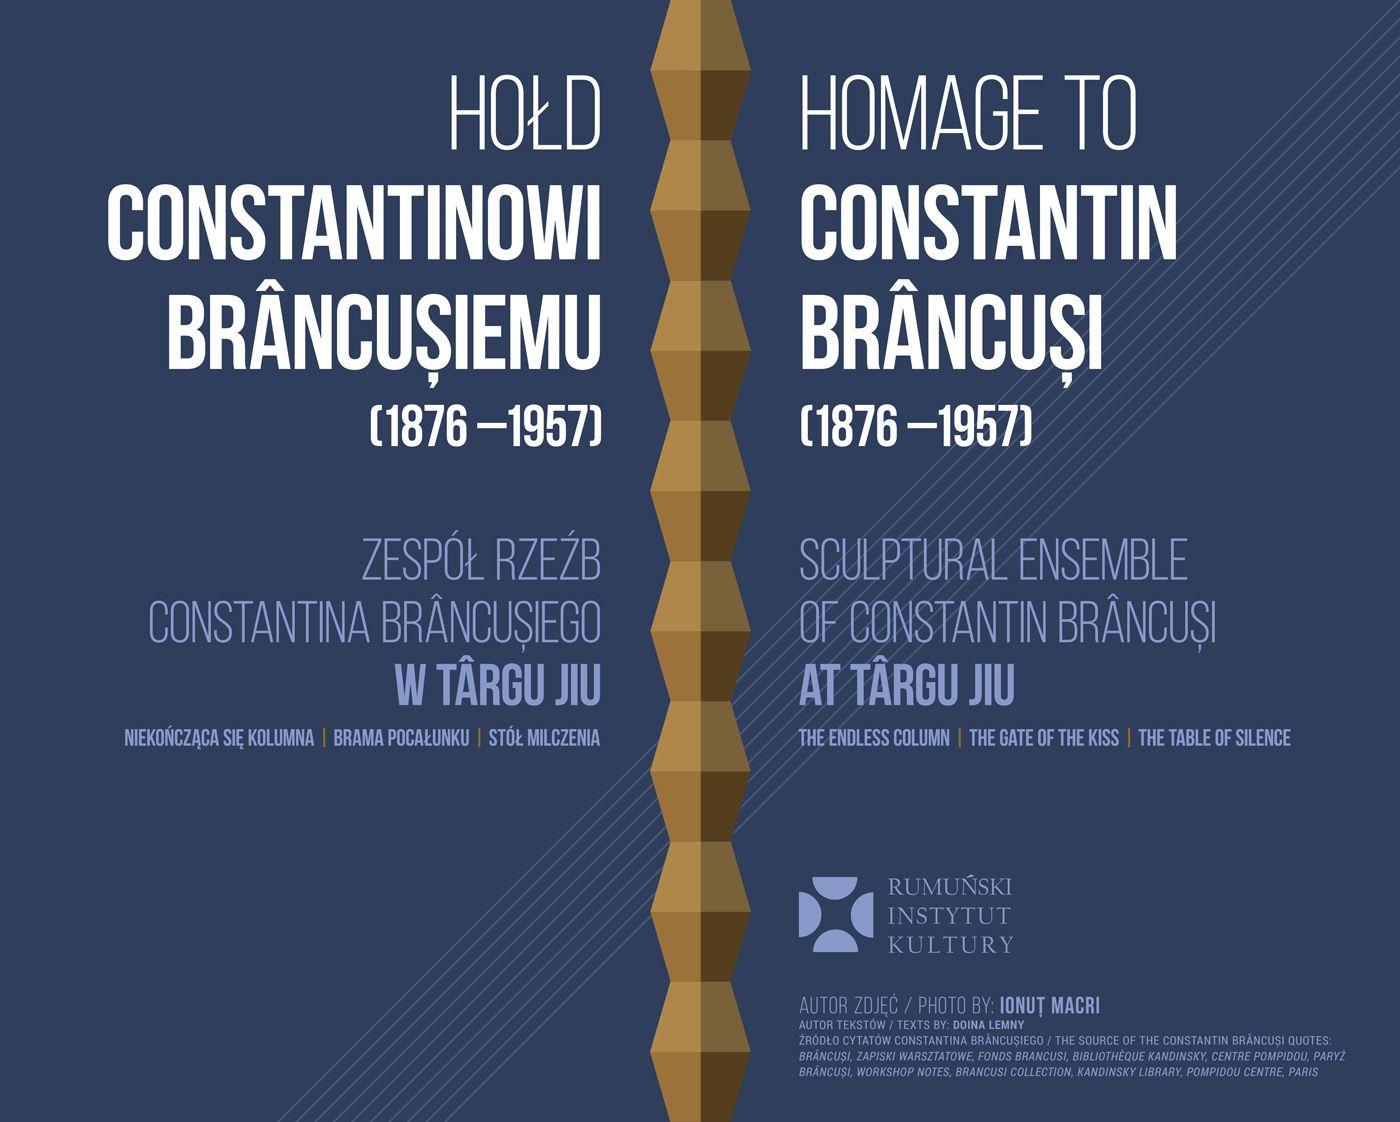 expo Brancusi plansa 1